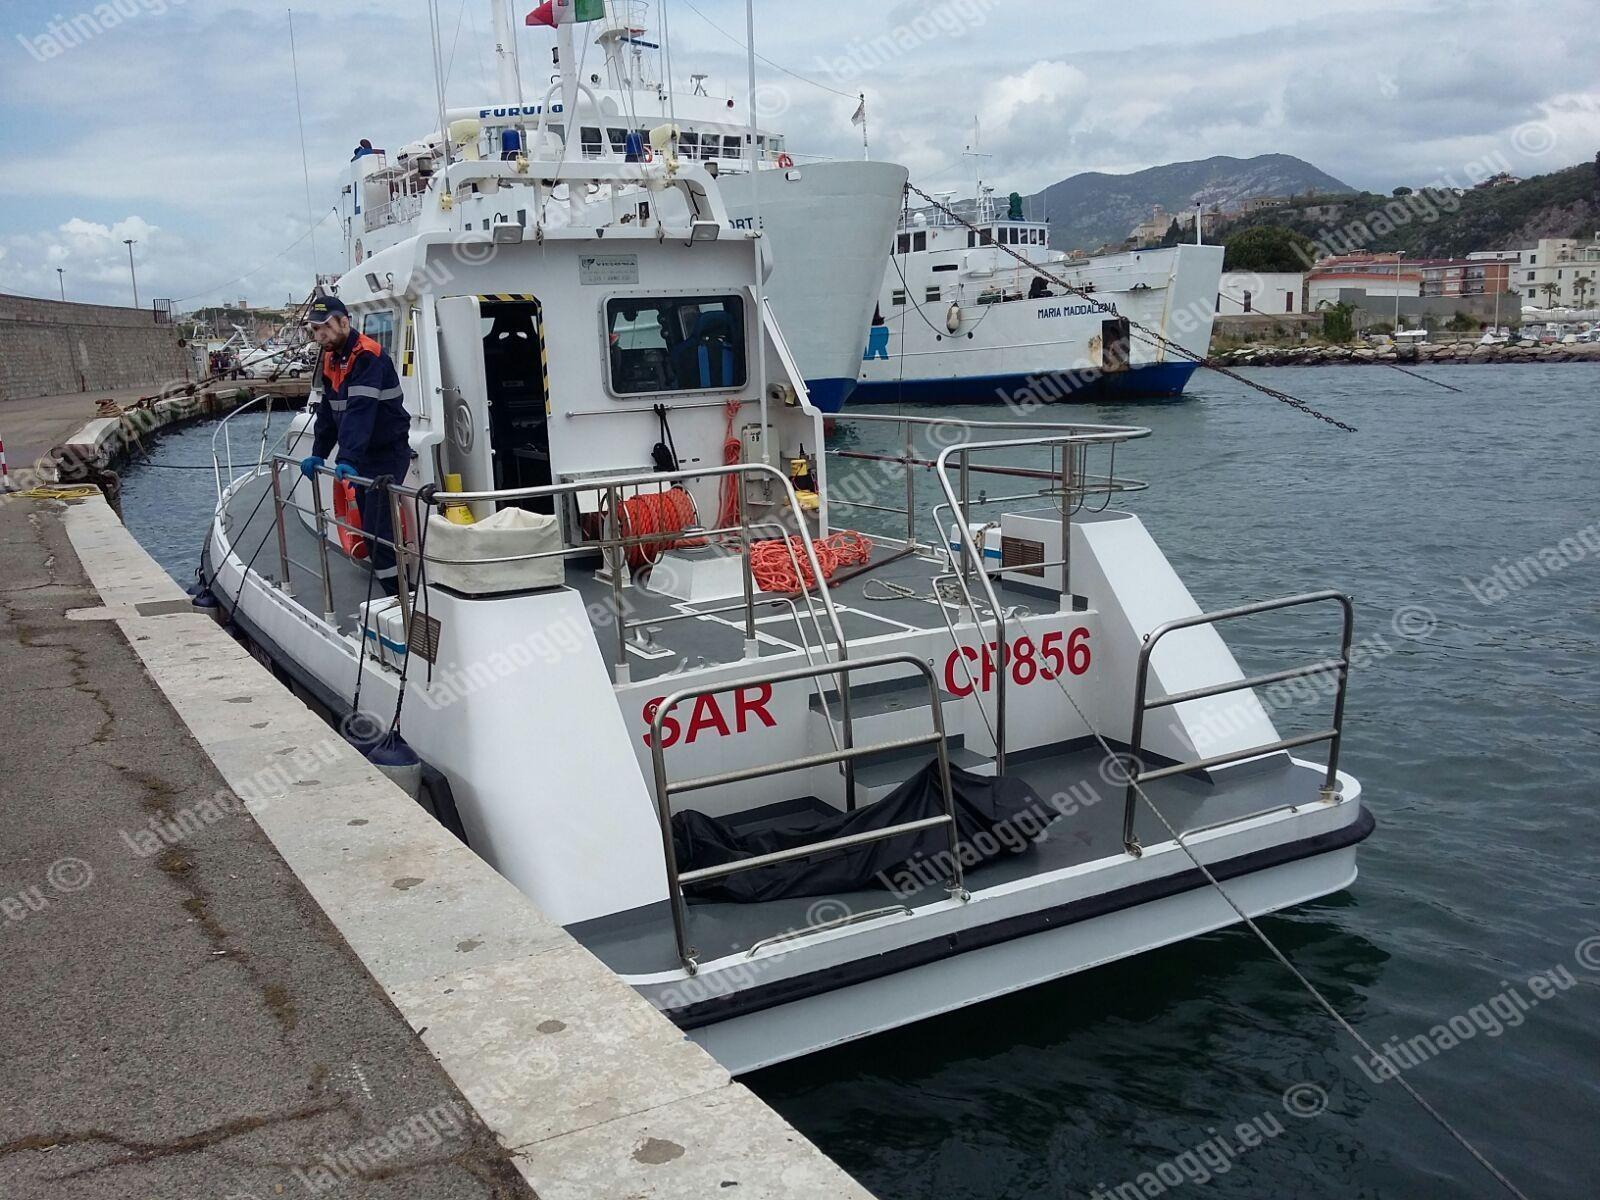 Recuperati due cadaveri in mare al largo di Terracina